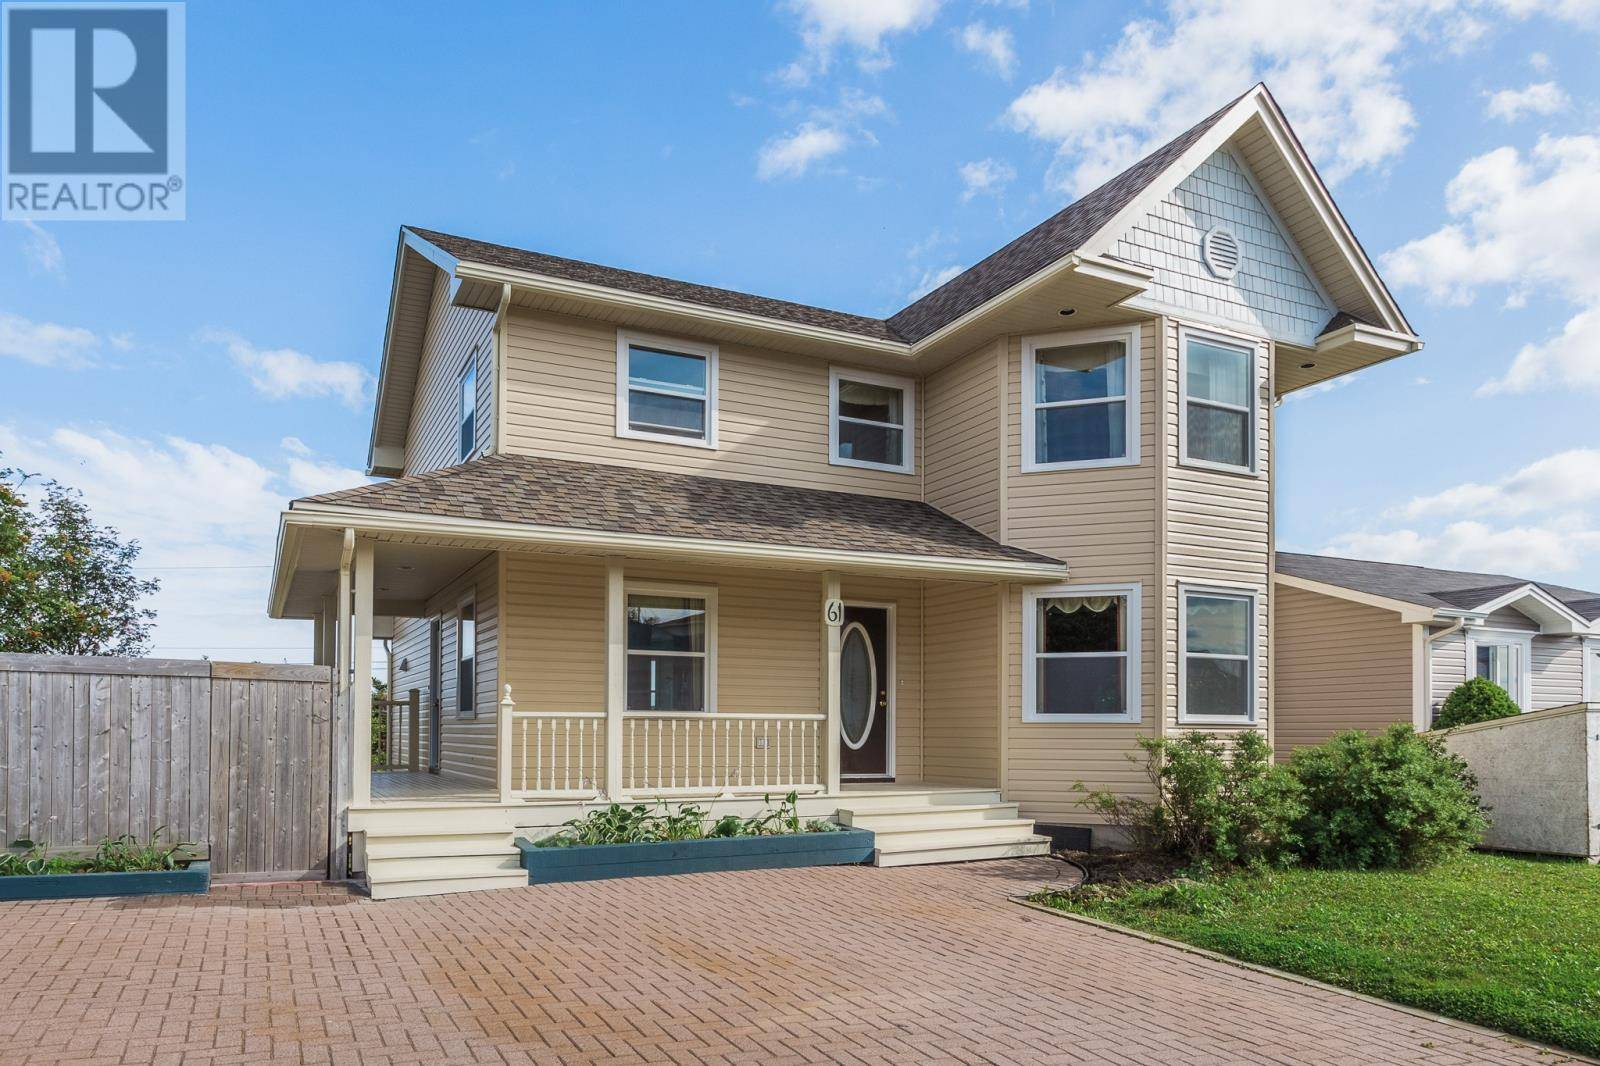 House for sale at 61 Frecker Dr St. John's Newfoundland - MLS: 1207058